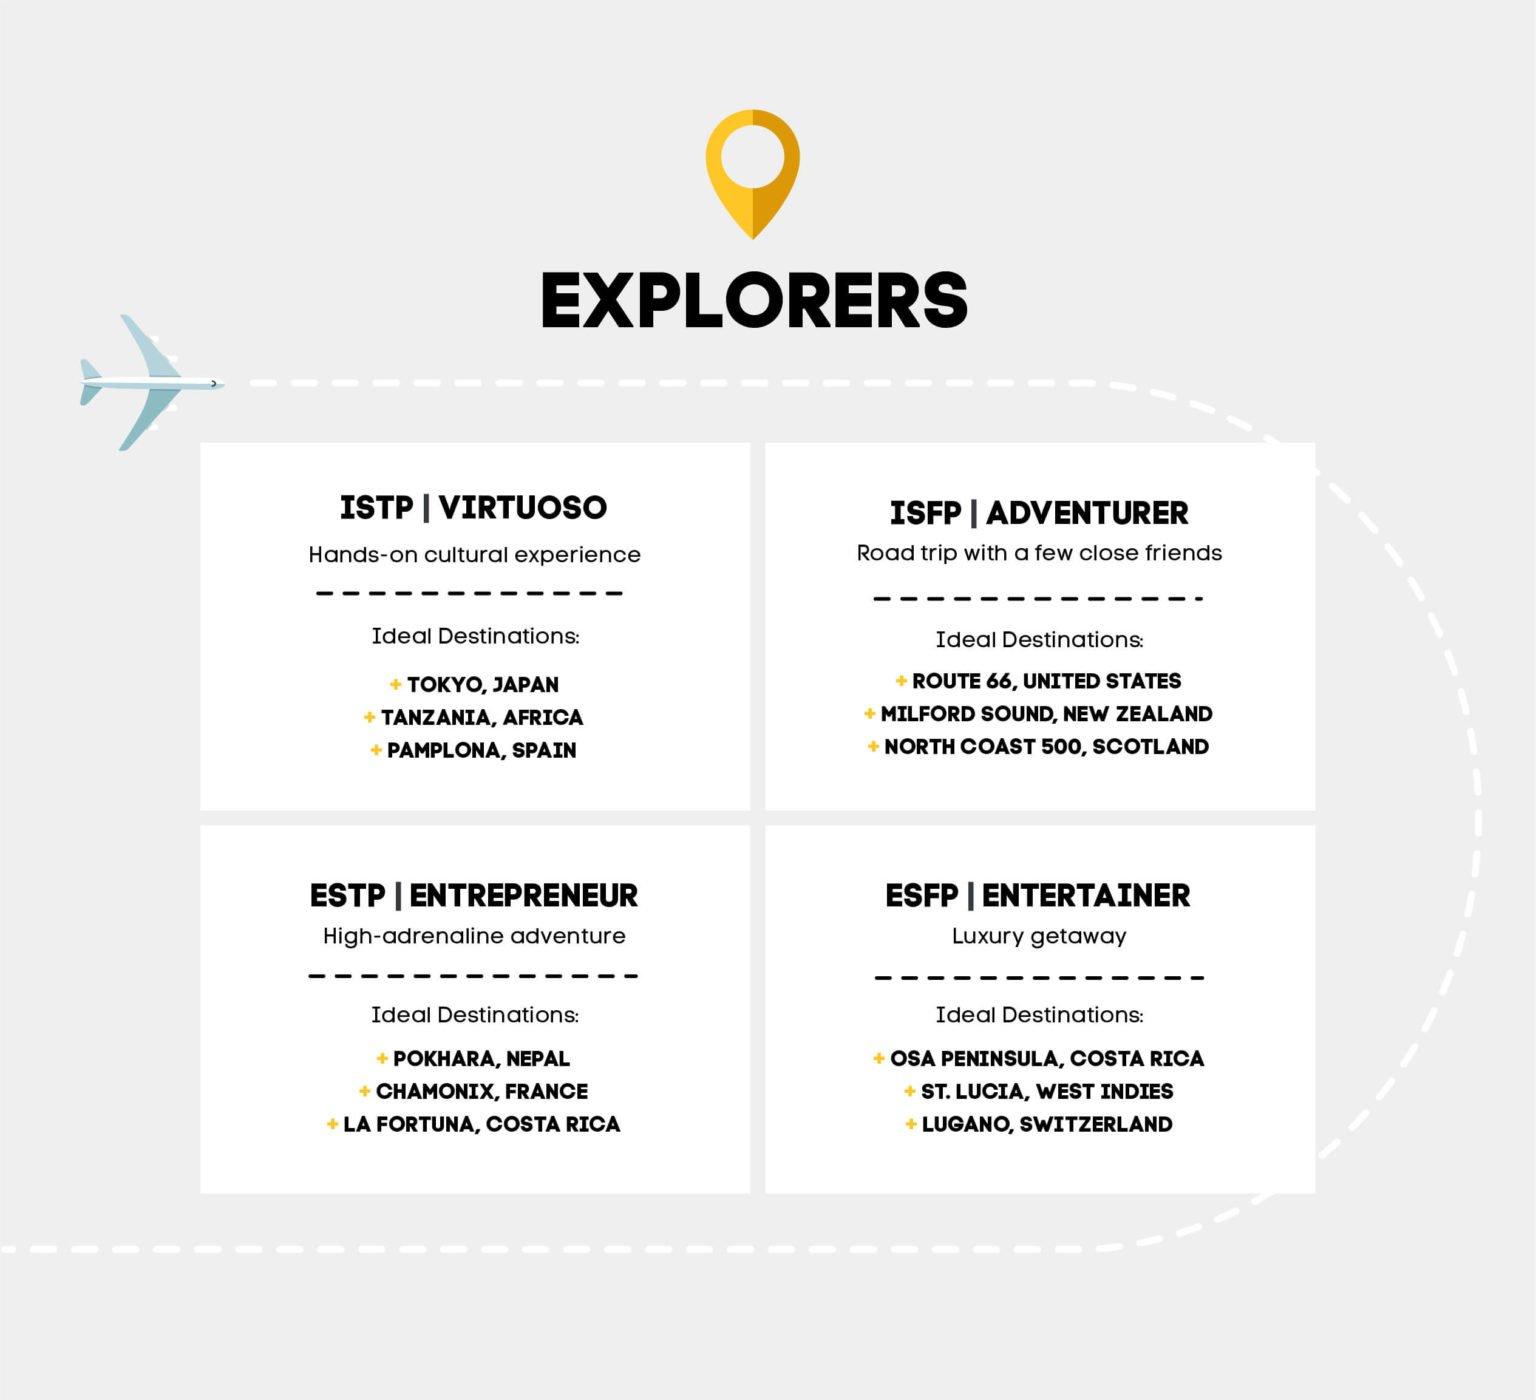 Explorer Personality Types